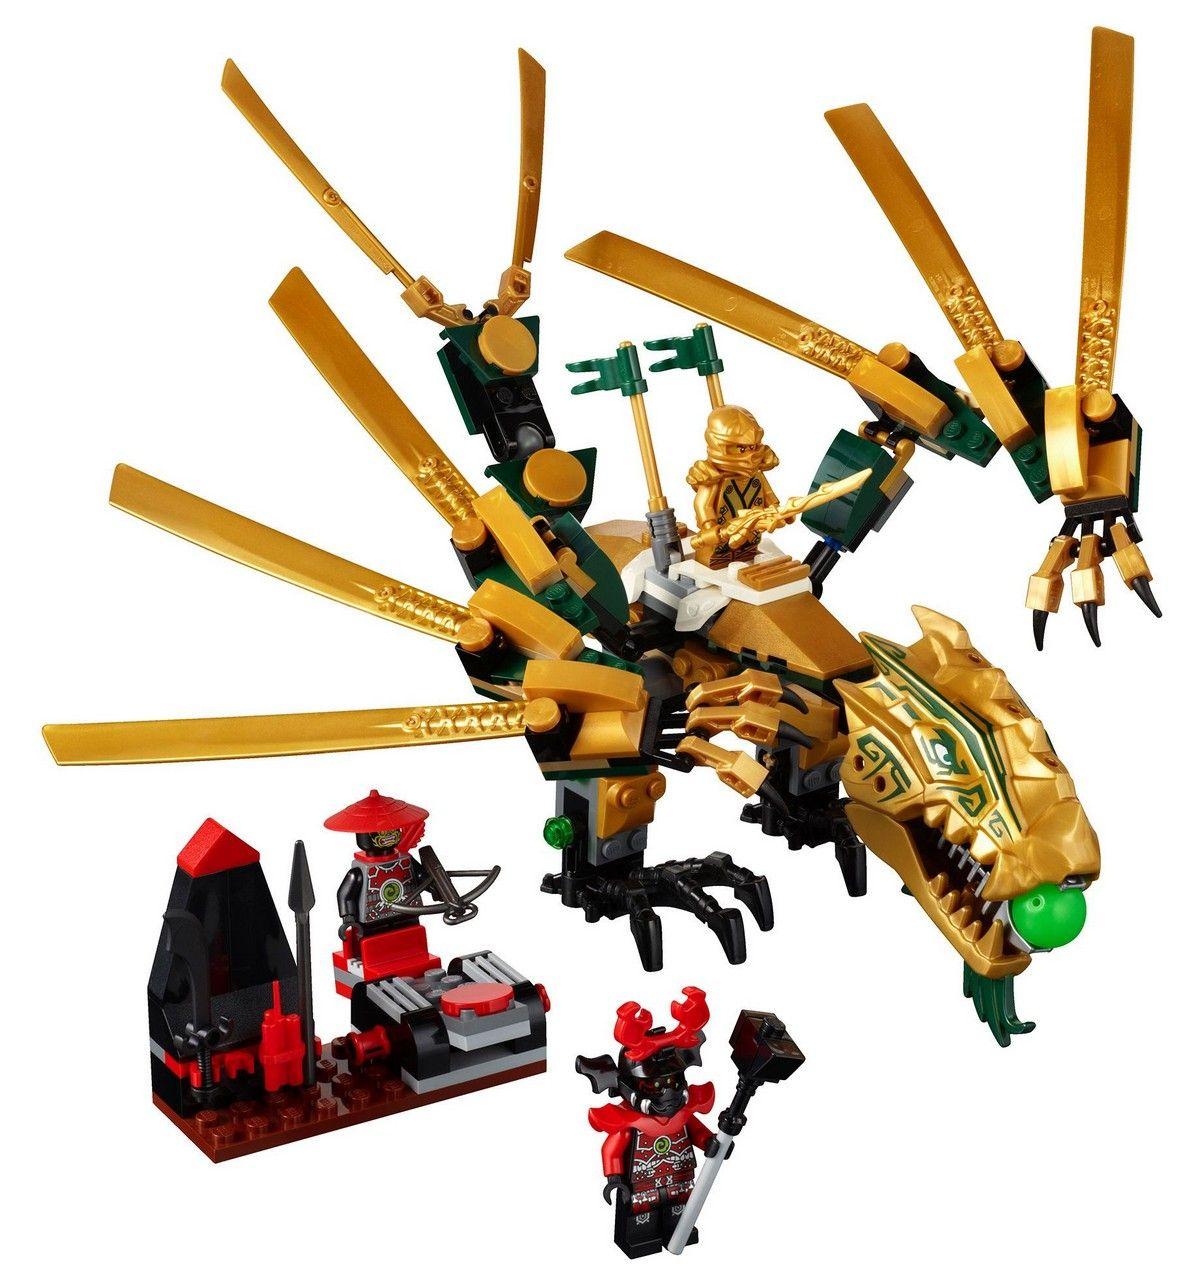 lego 70503 golden dragon ninjago ibrickcity 4 970x1024 lego 70503 the golden dragon - Ninjago Rouge